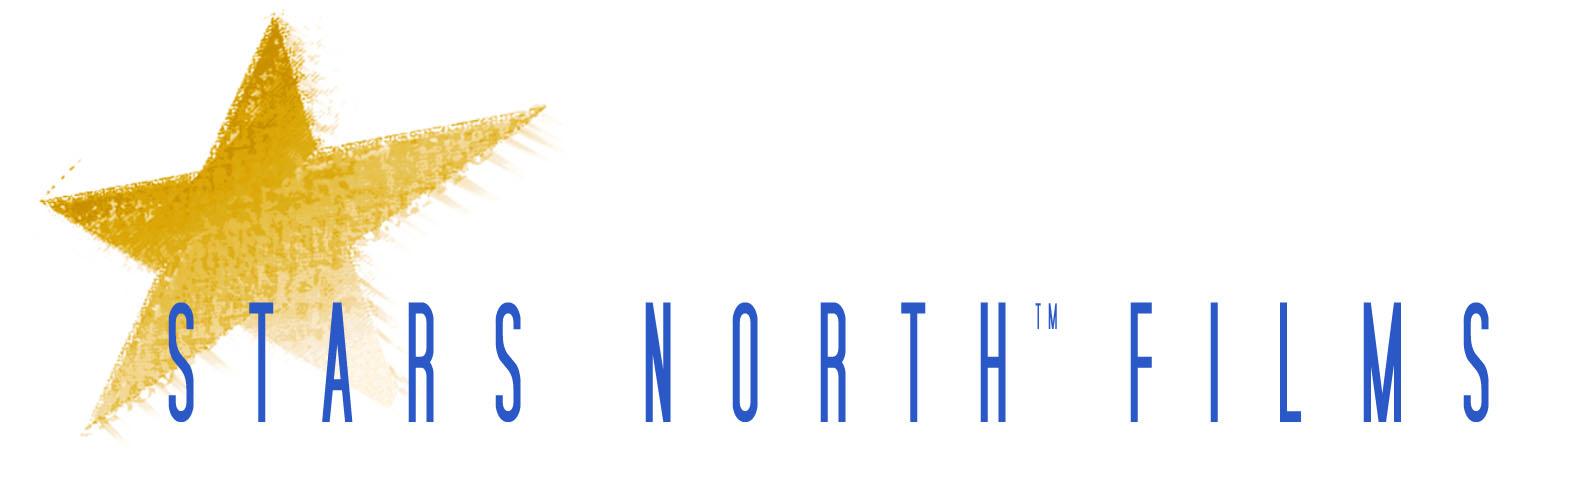 Stars North